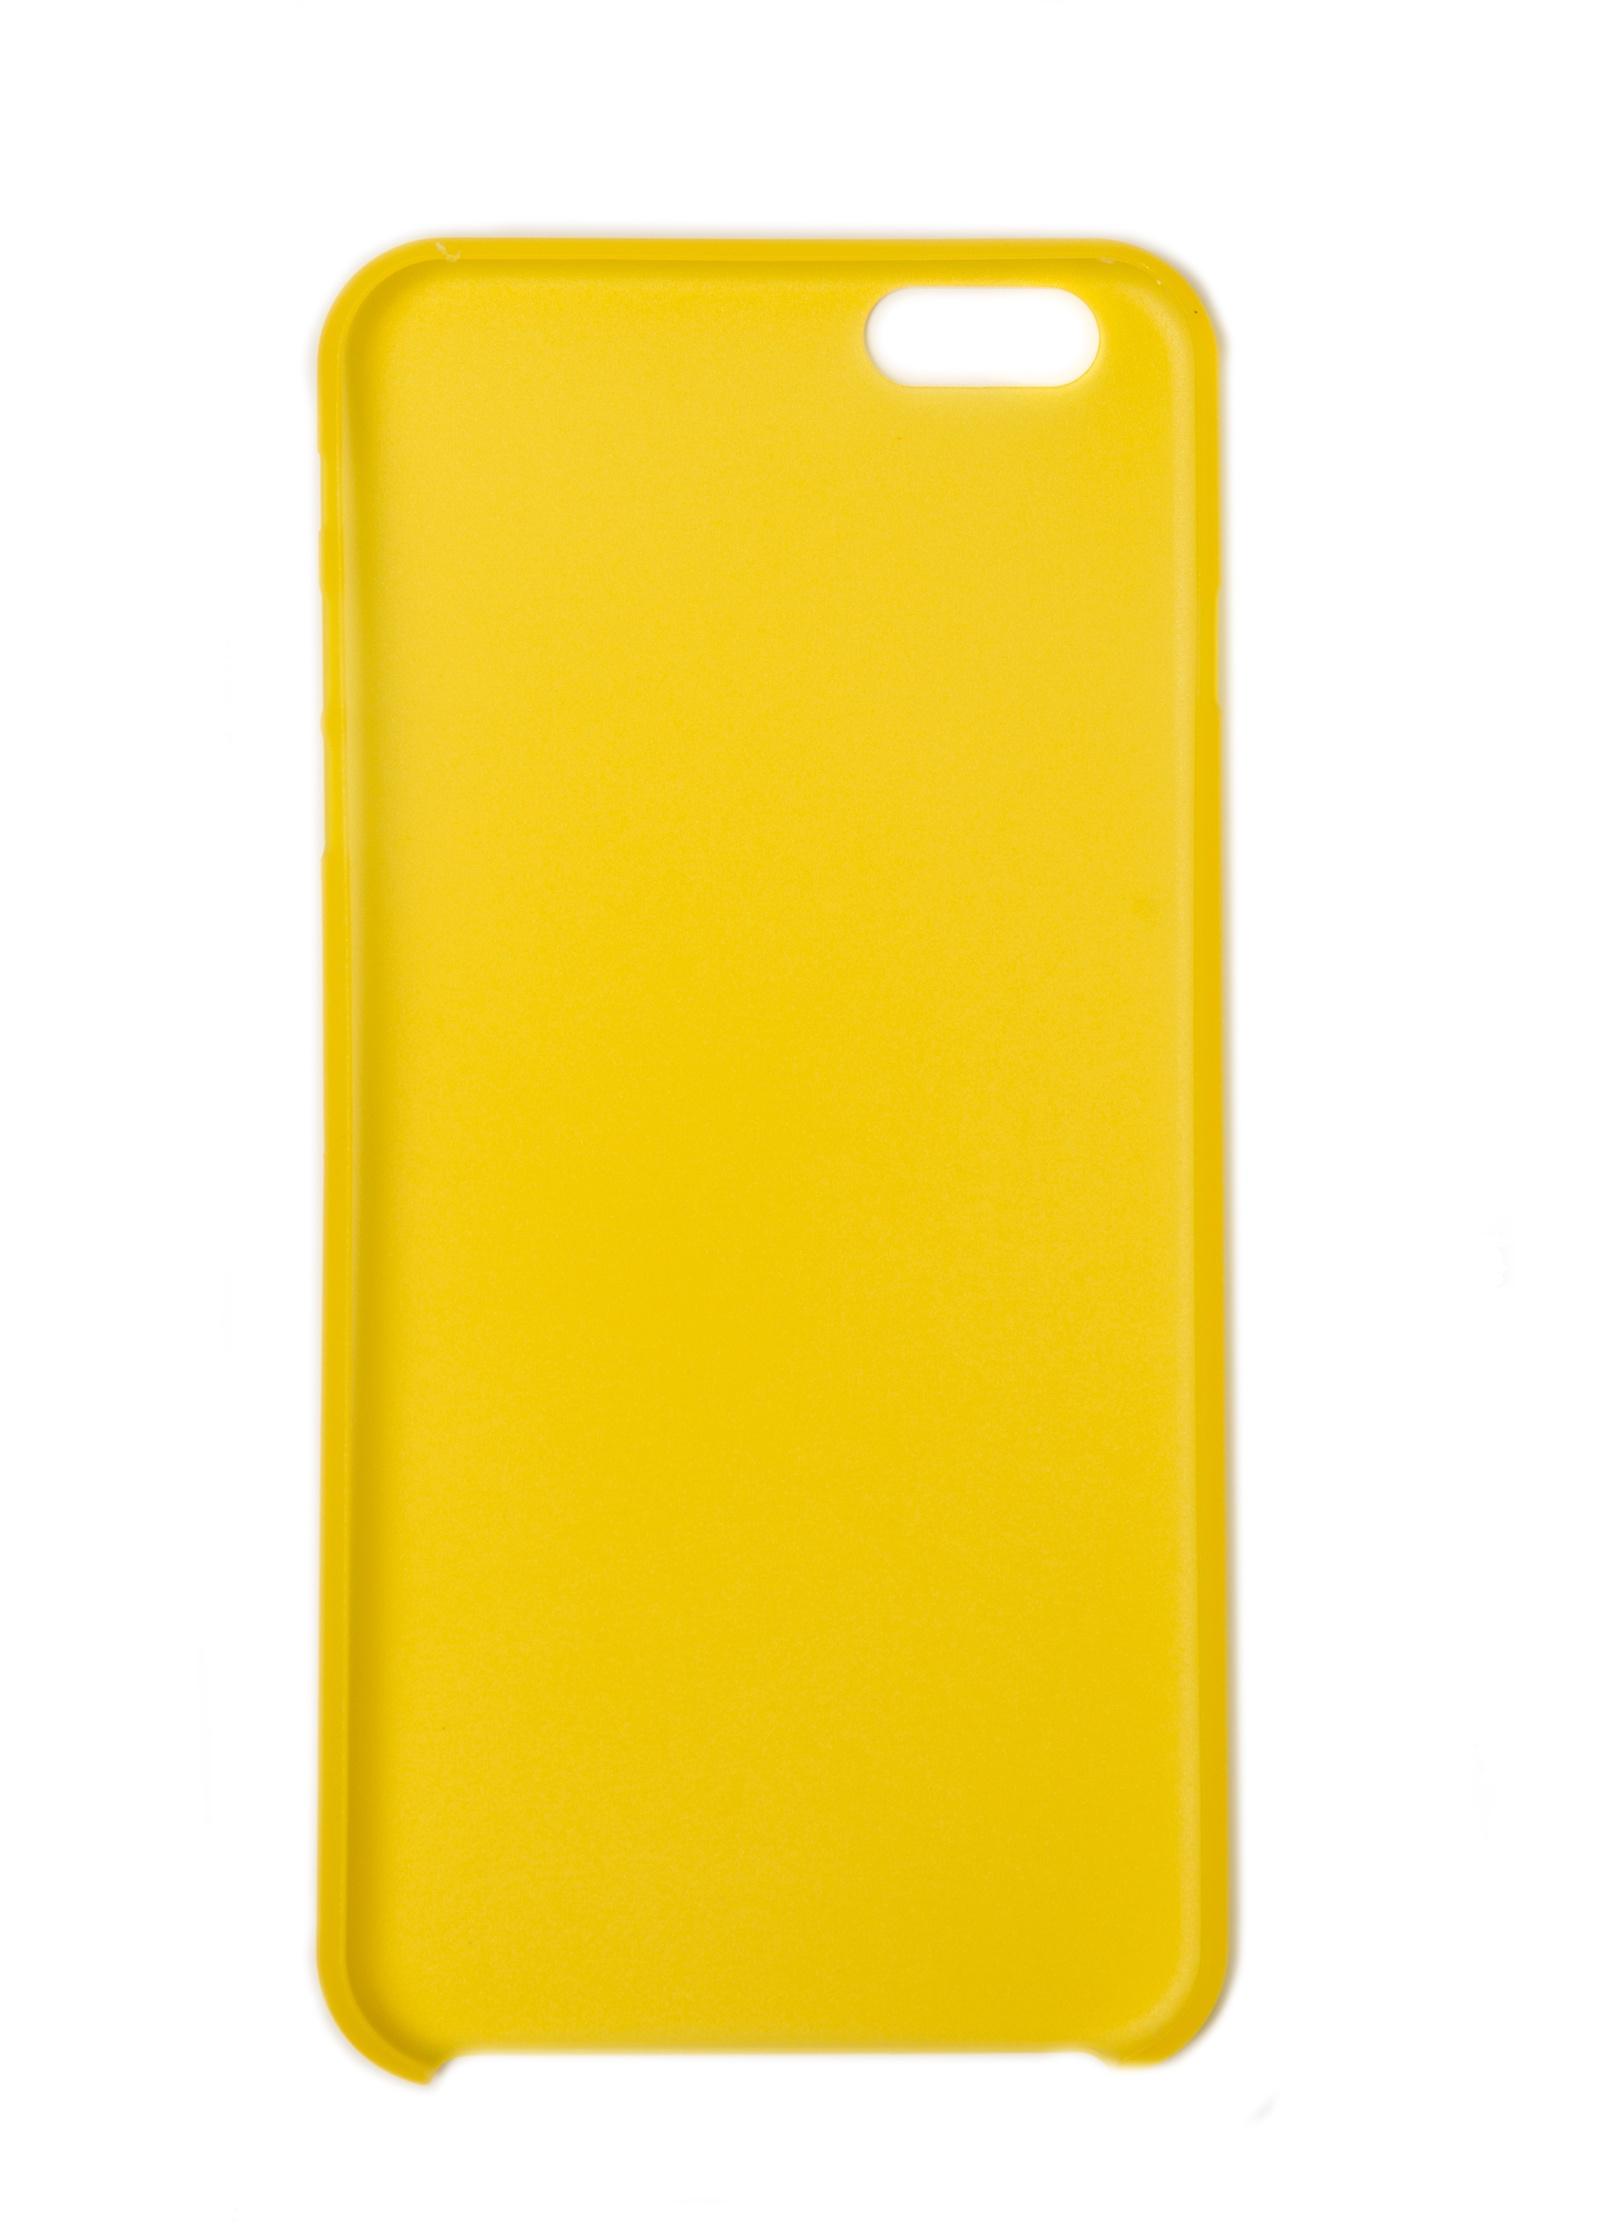 Чехол для сотового телефона Mitya Veselkov CASE, IP6.МITYA-236PVC все цены